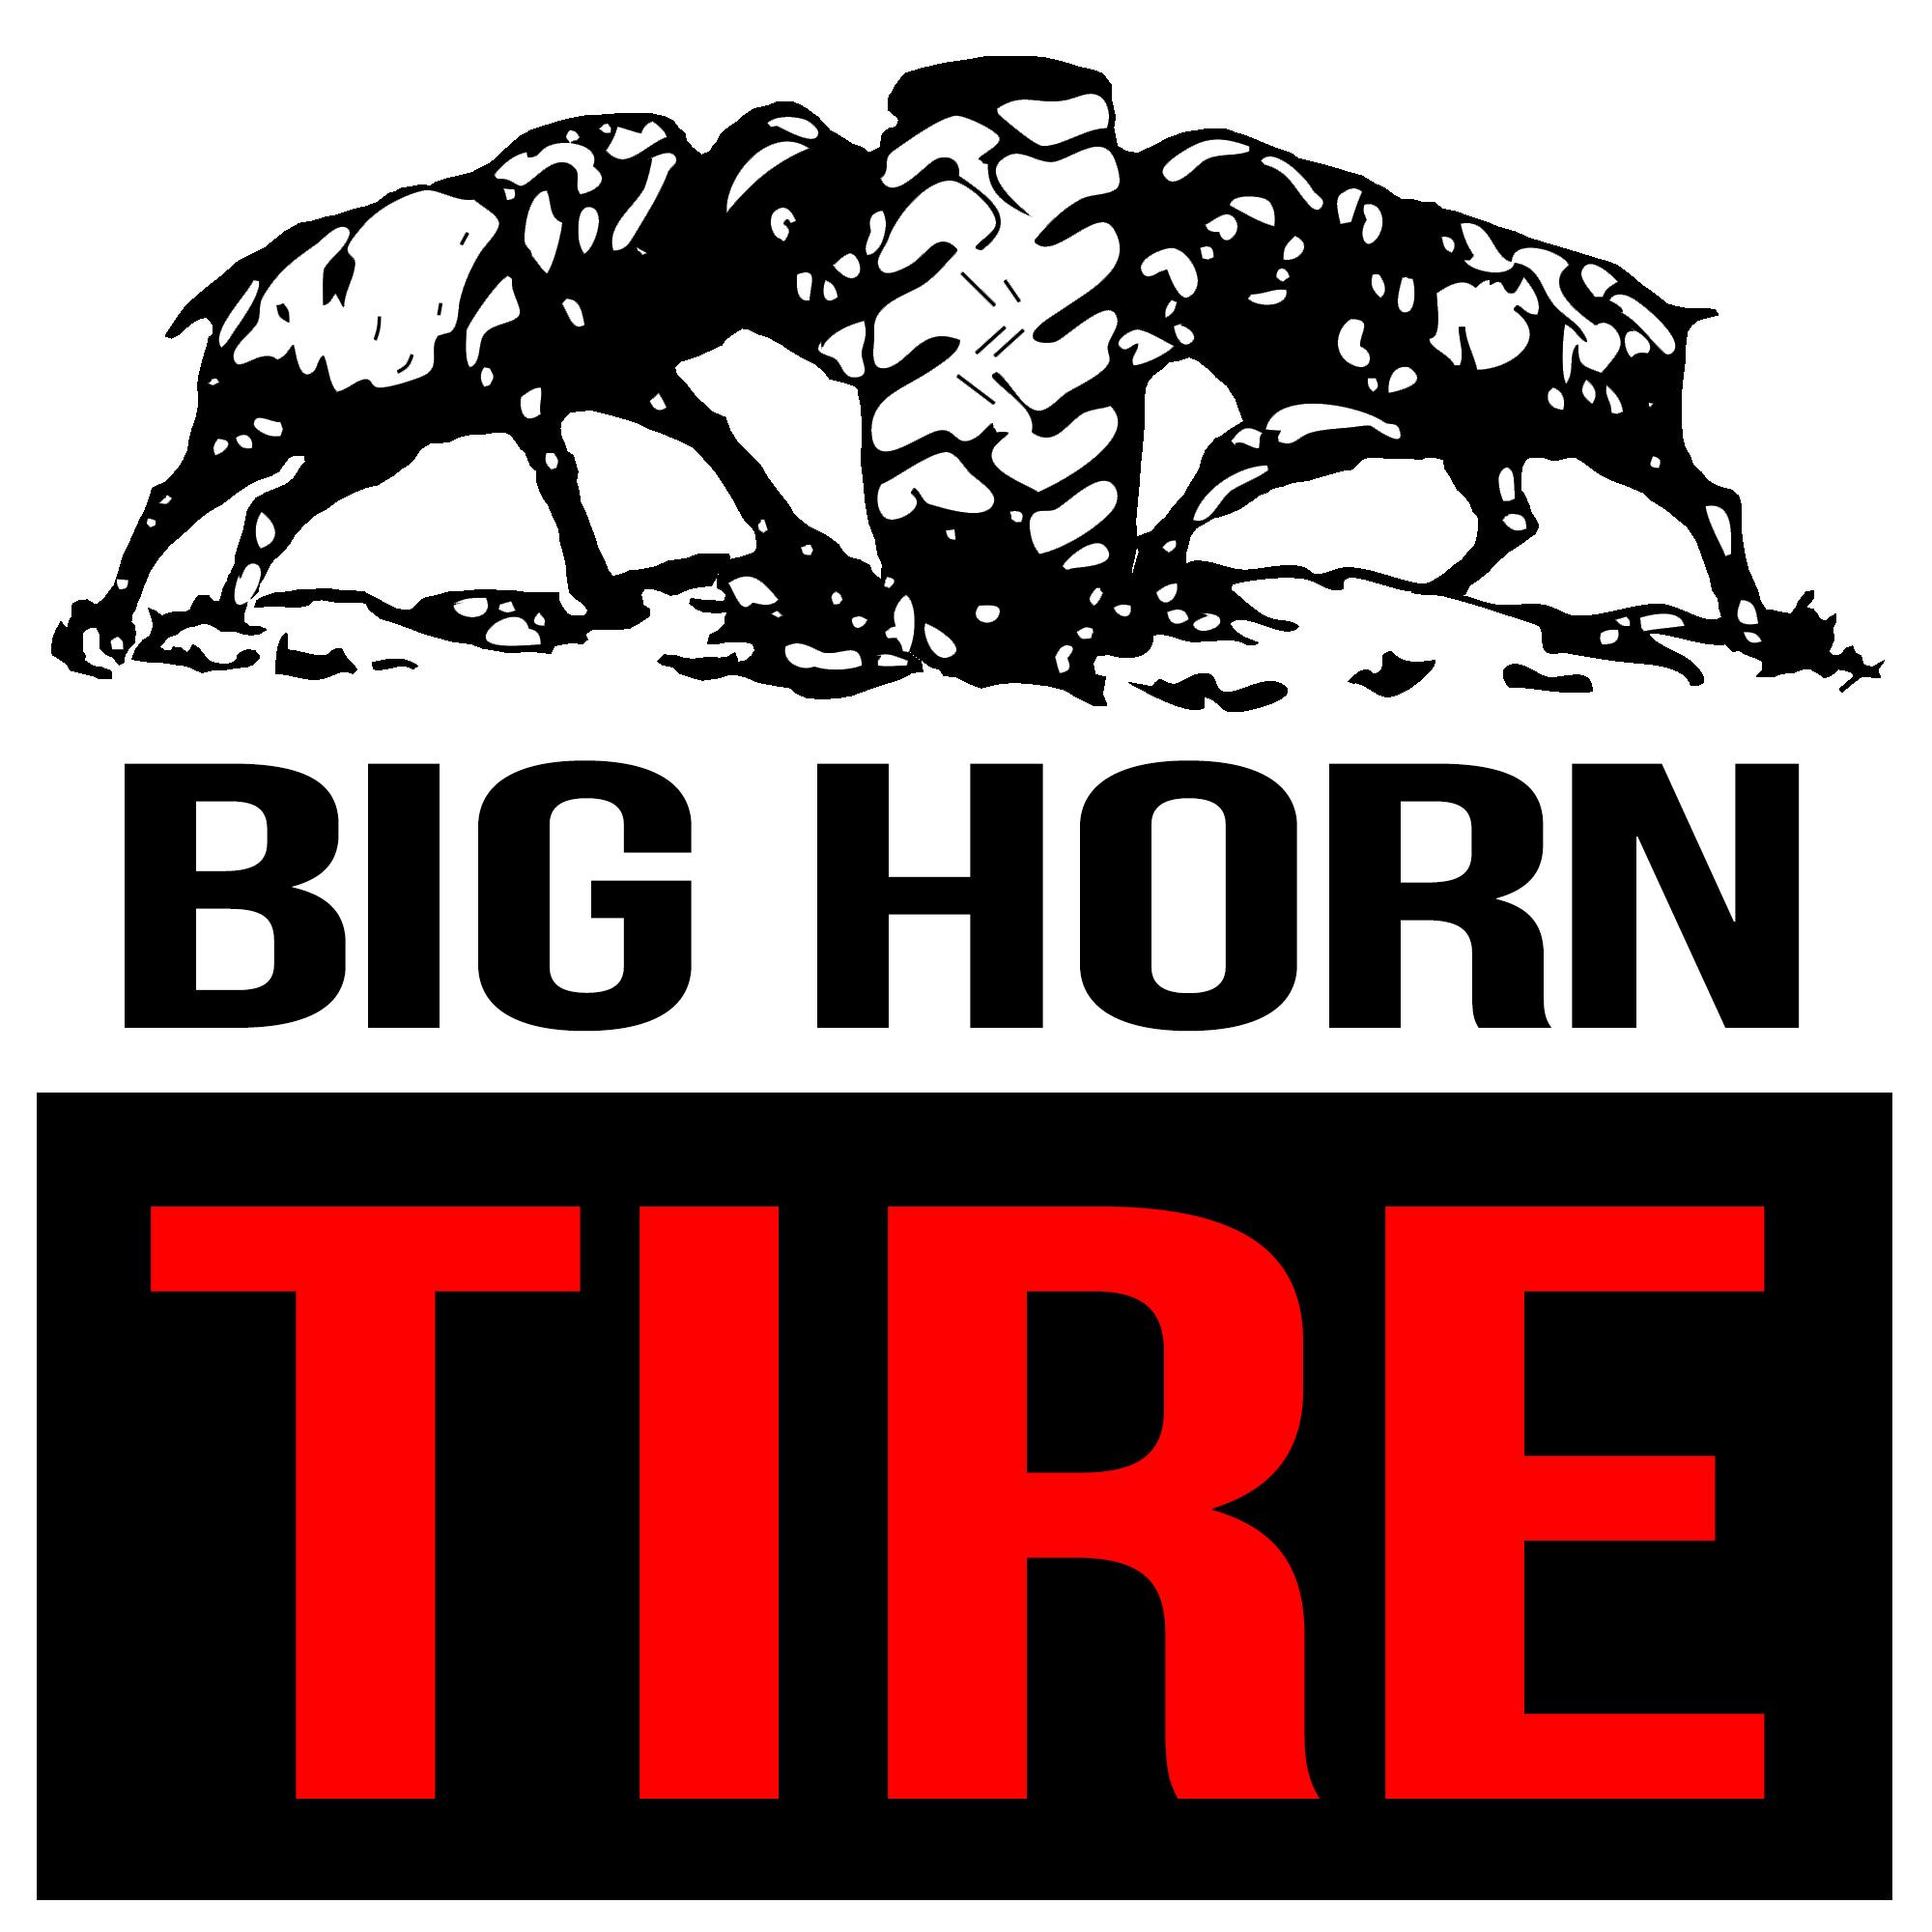 Big Horn Tire image 11